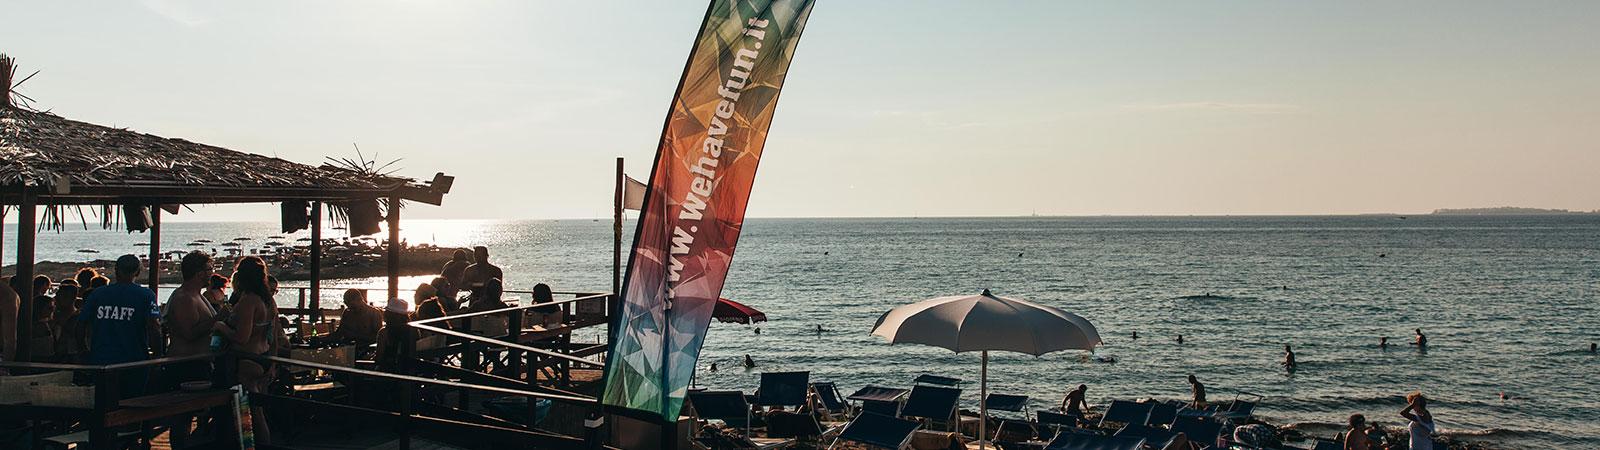 salento-gallipoli-b1-vacanze-gallipoli